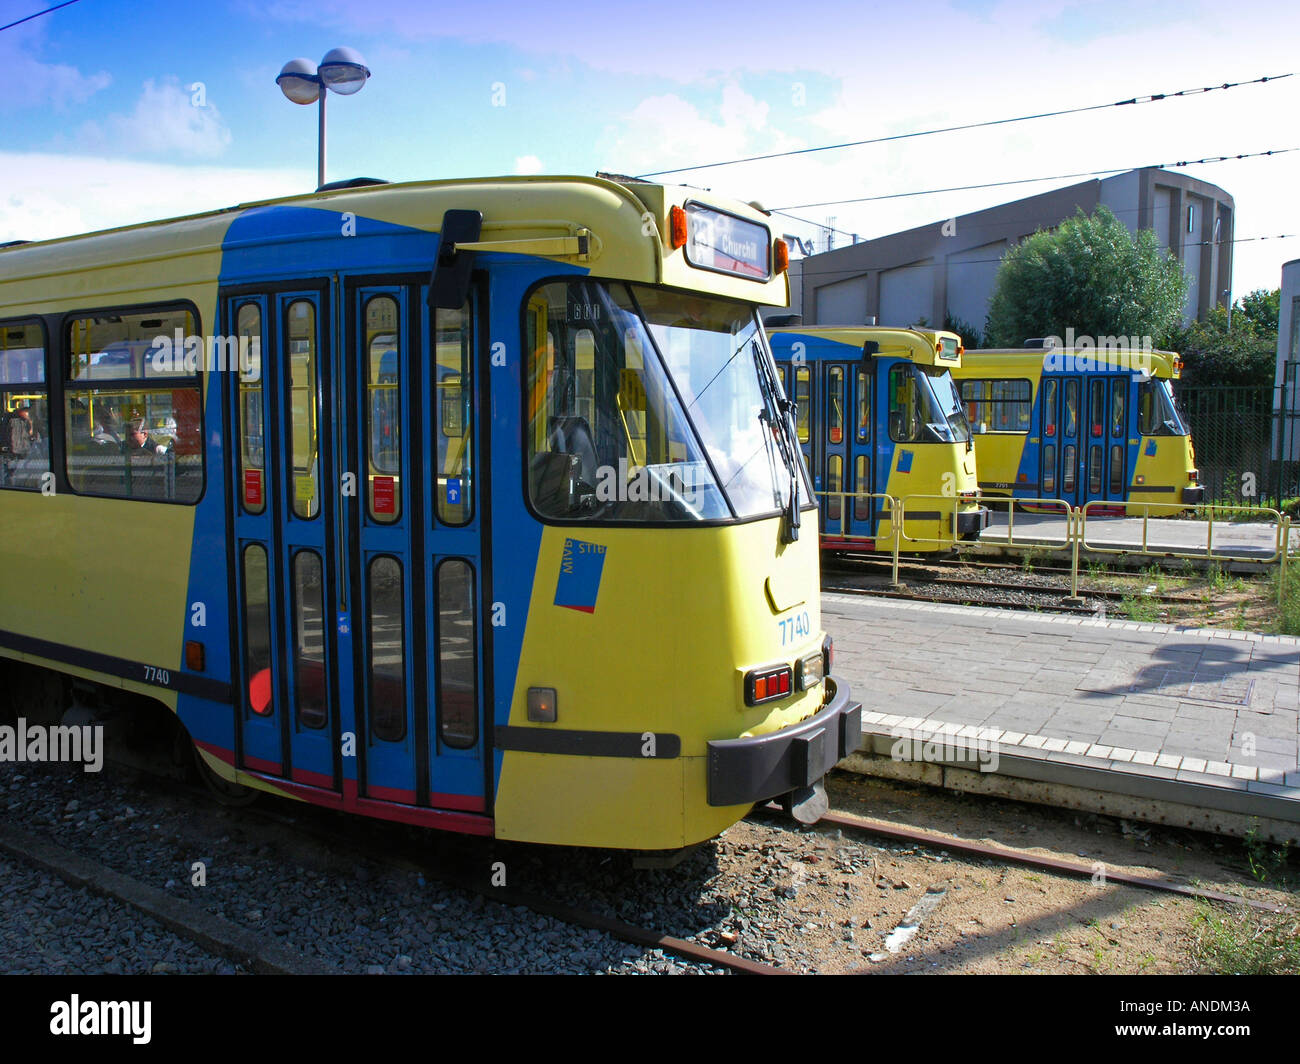 Tram Brussels Bruxelles Belgium Travel transport transportation logistic  - Stock Image